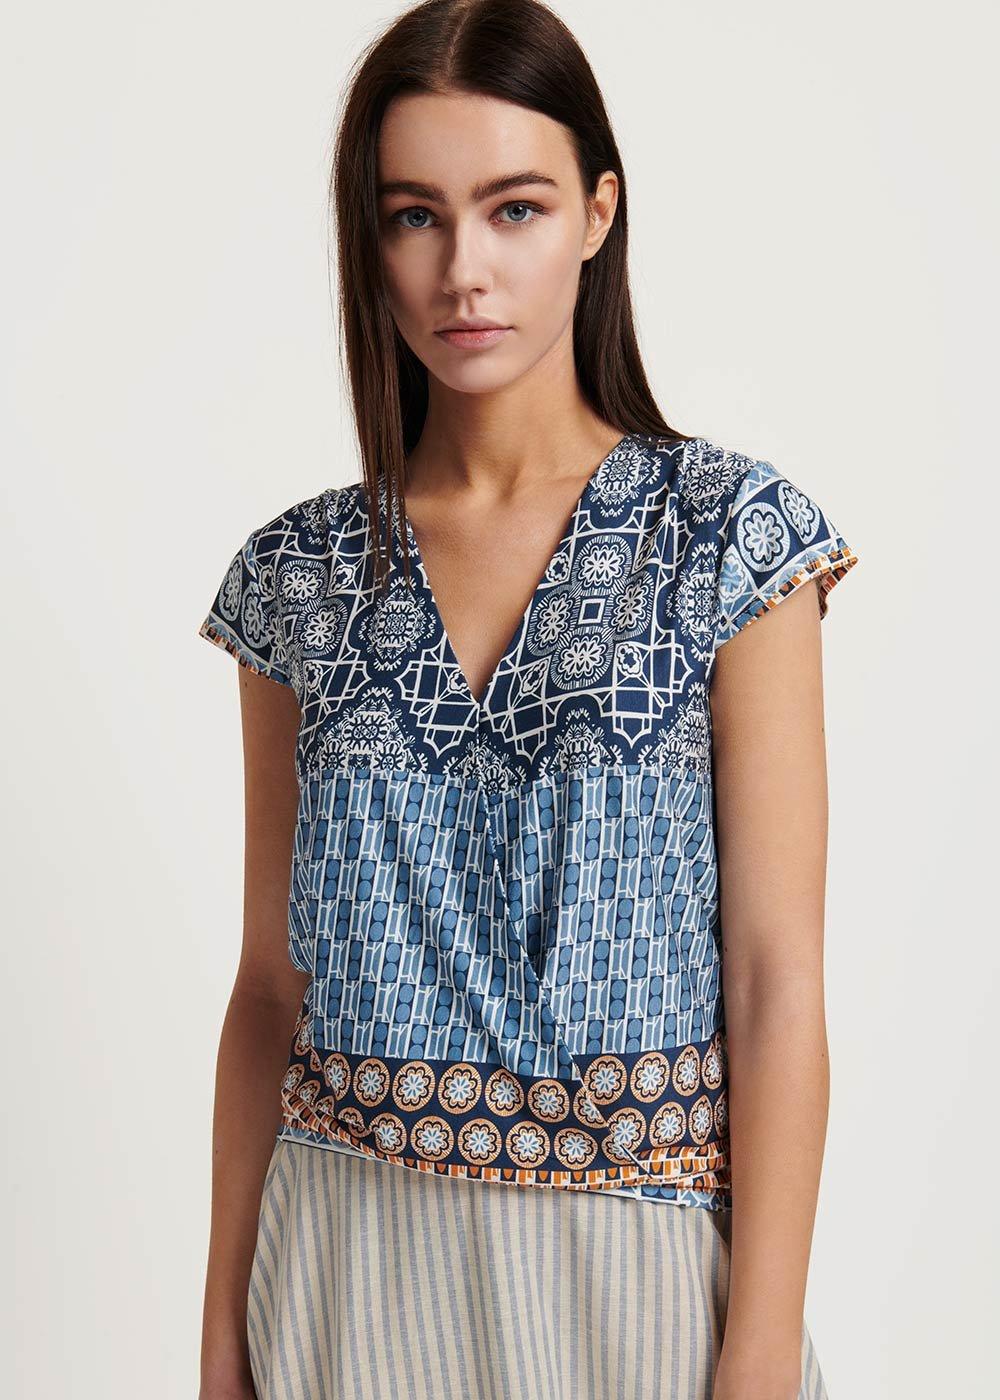 Sidony v-neck patterned t-shirt - Medium Blue \ Cacao - Woman